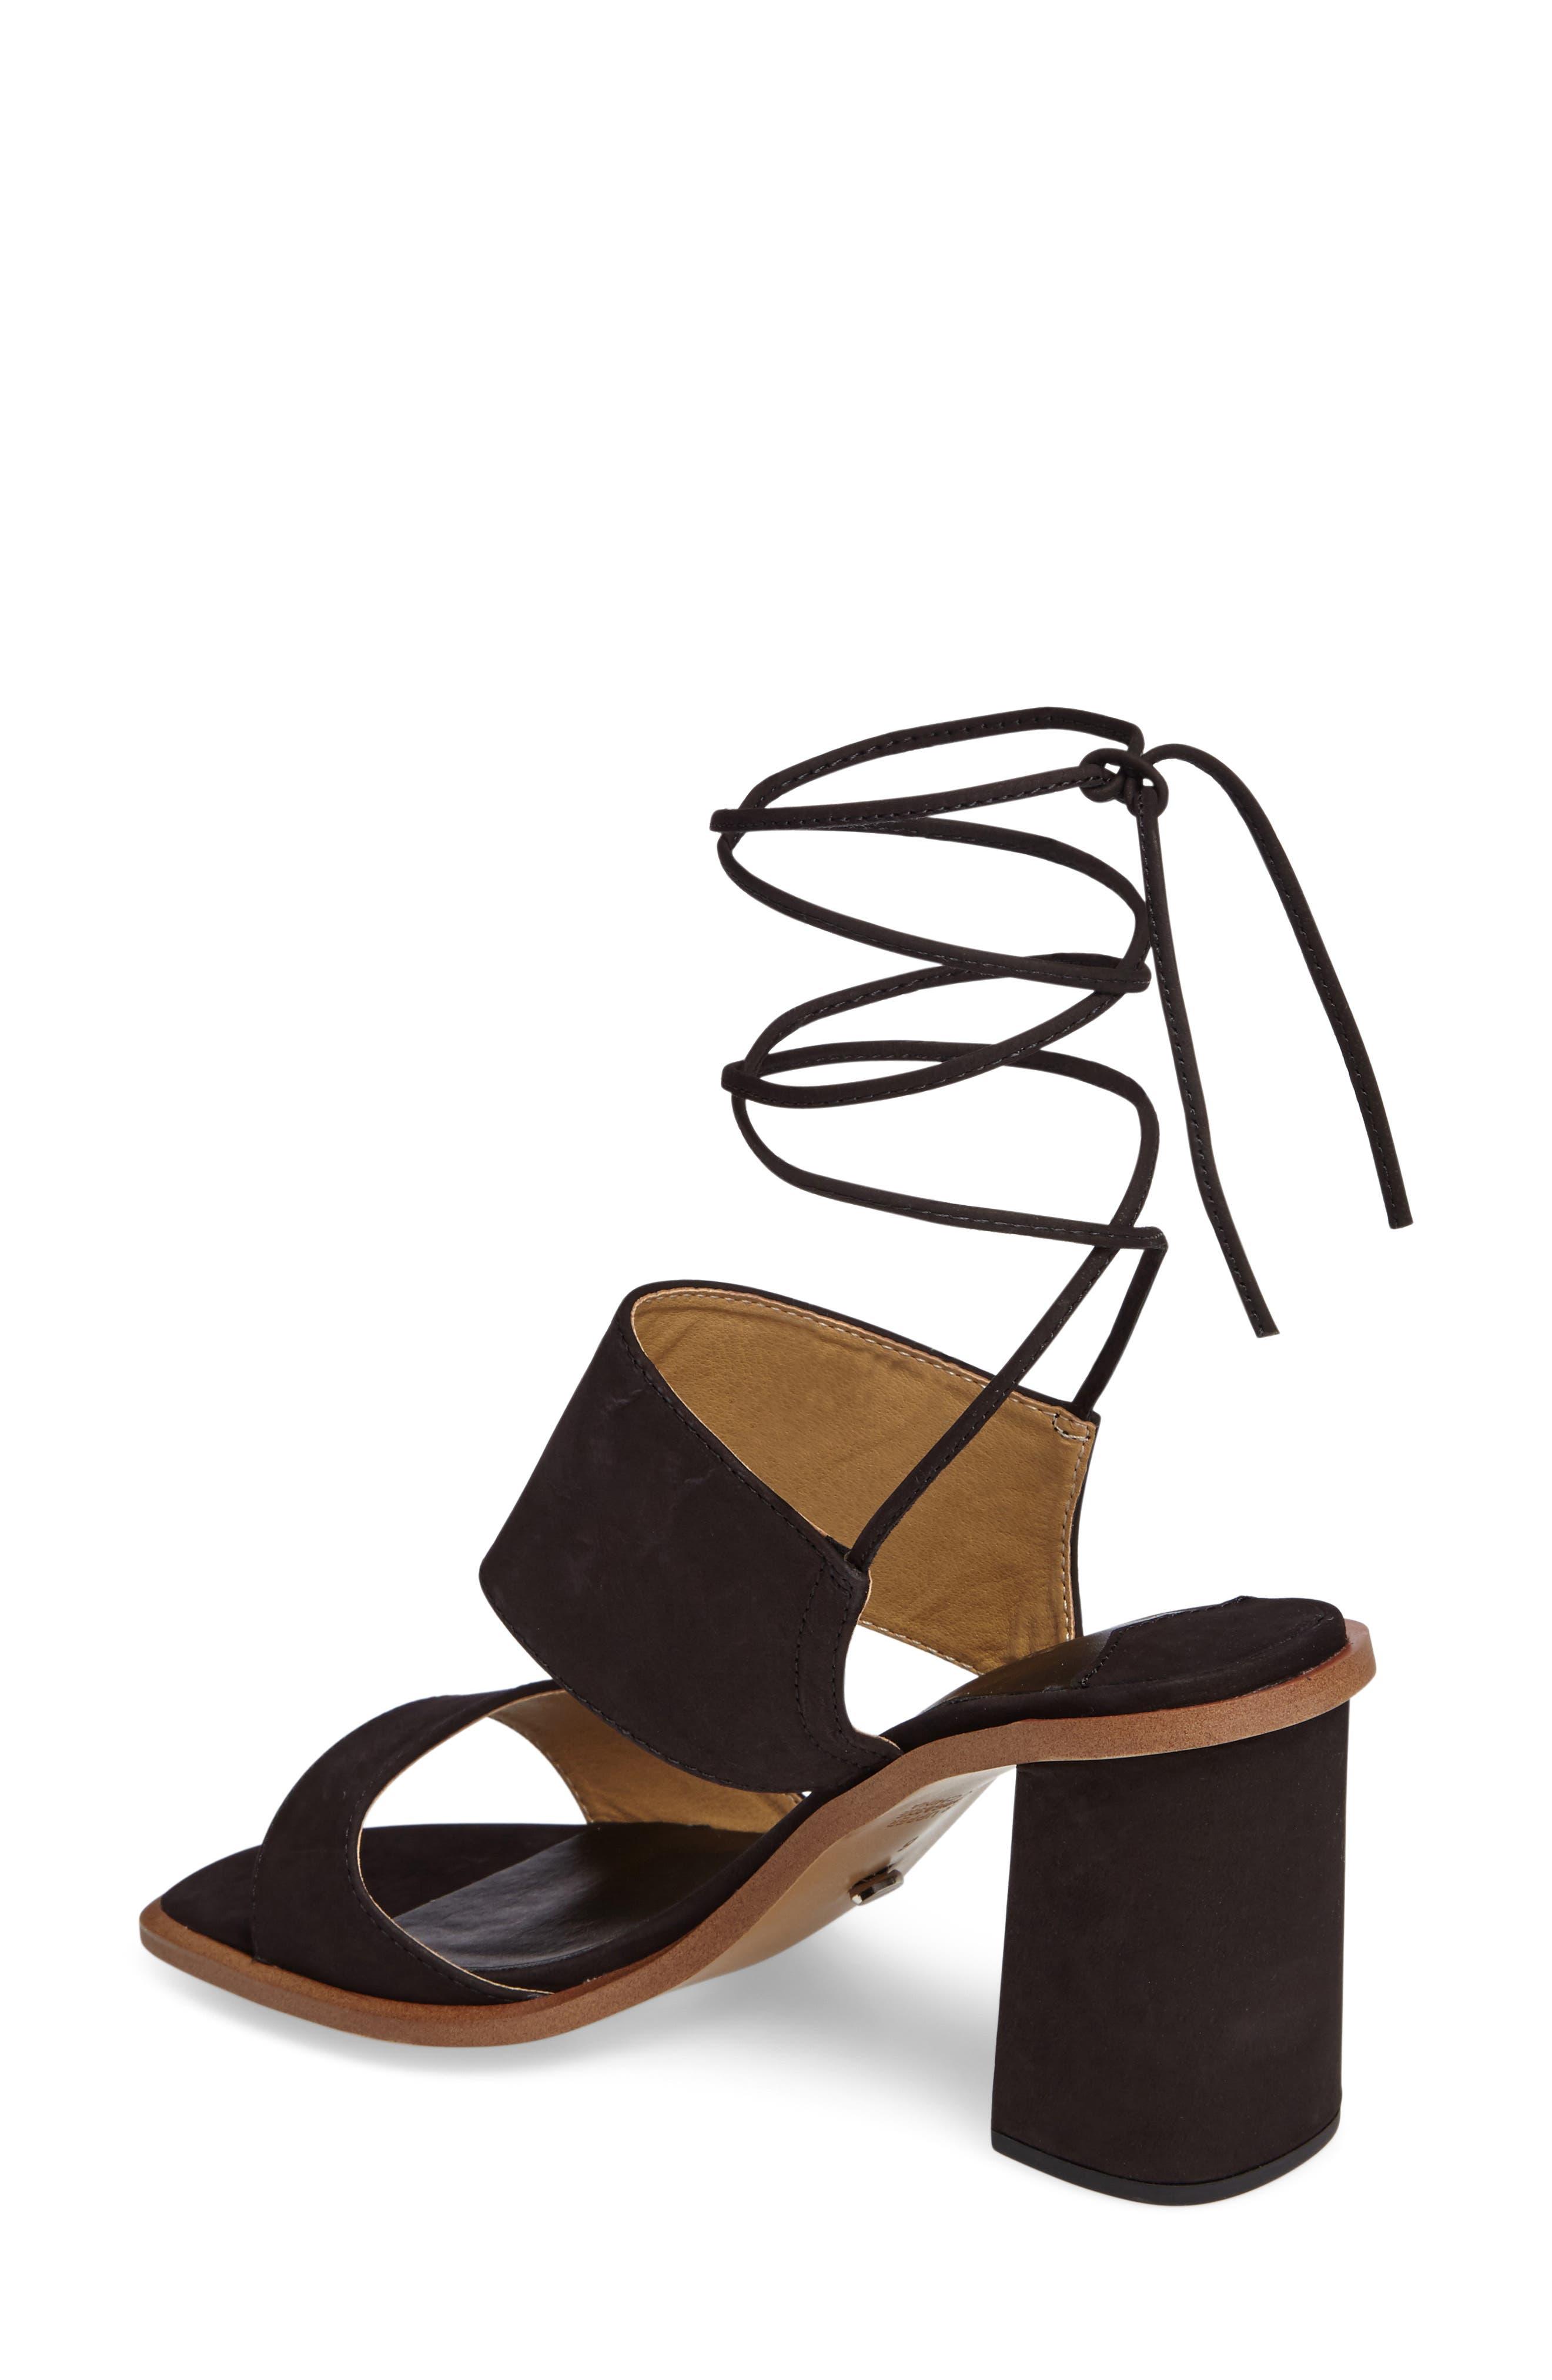 Cuoco Ankle Strap Sandal,                             Alternate thumbnail 2, color,                             001